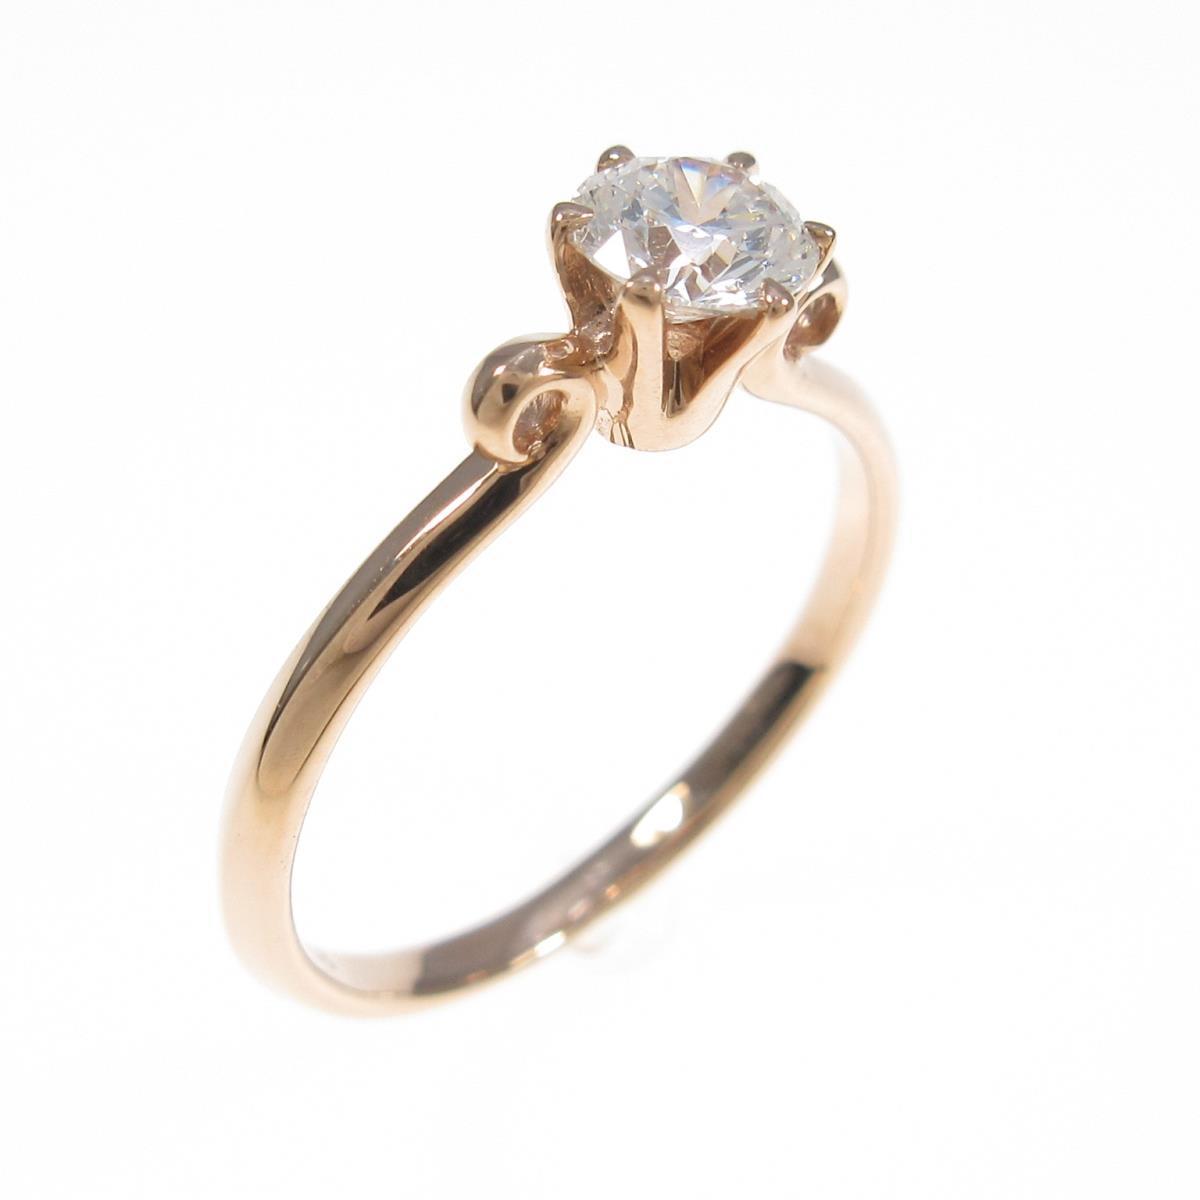 K18PG ダイヤモンドリング 0.281ct・E・VS1・3EX H&C【中古】